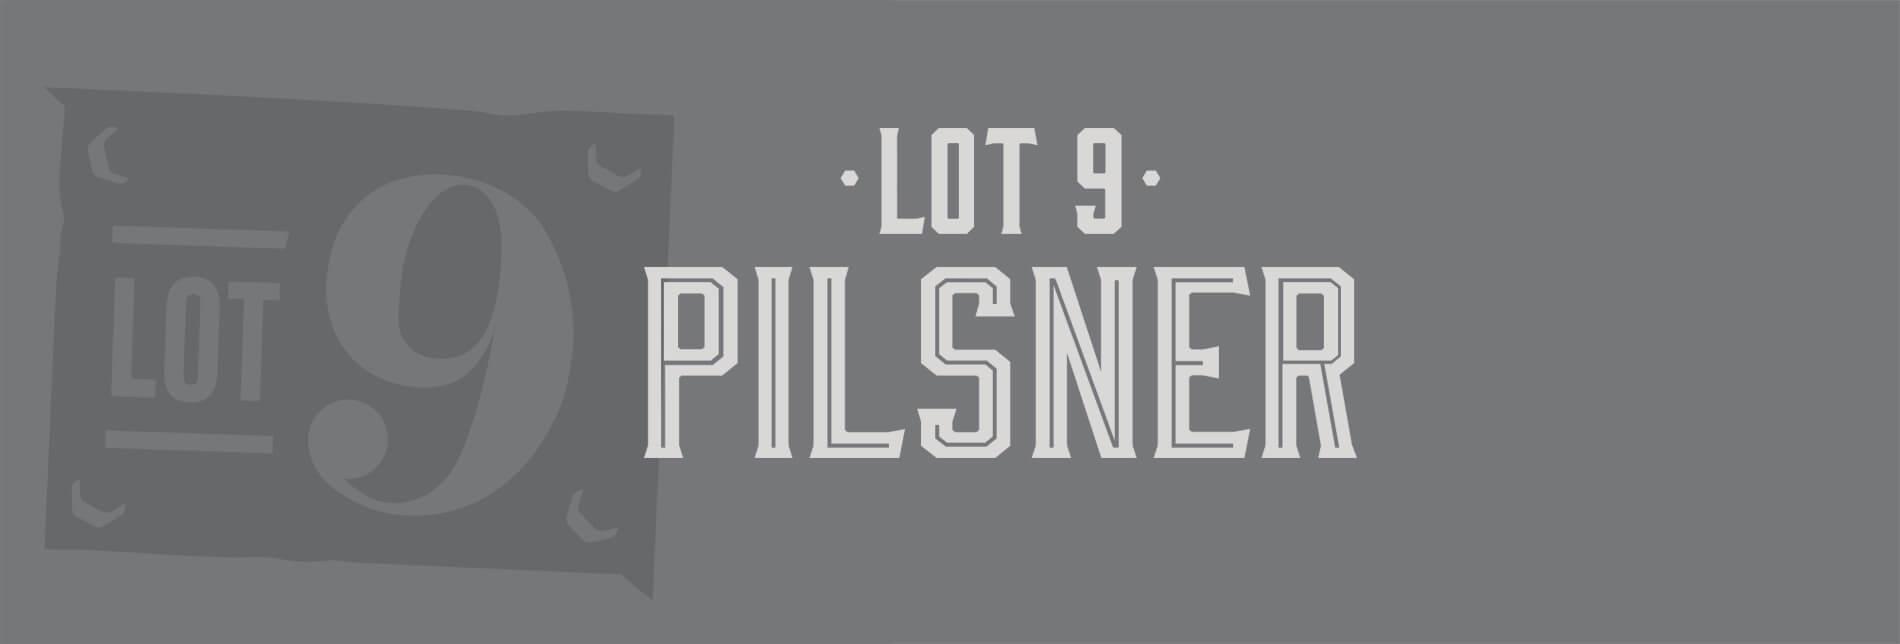 Lot 9 Pilsner